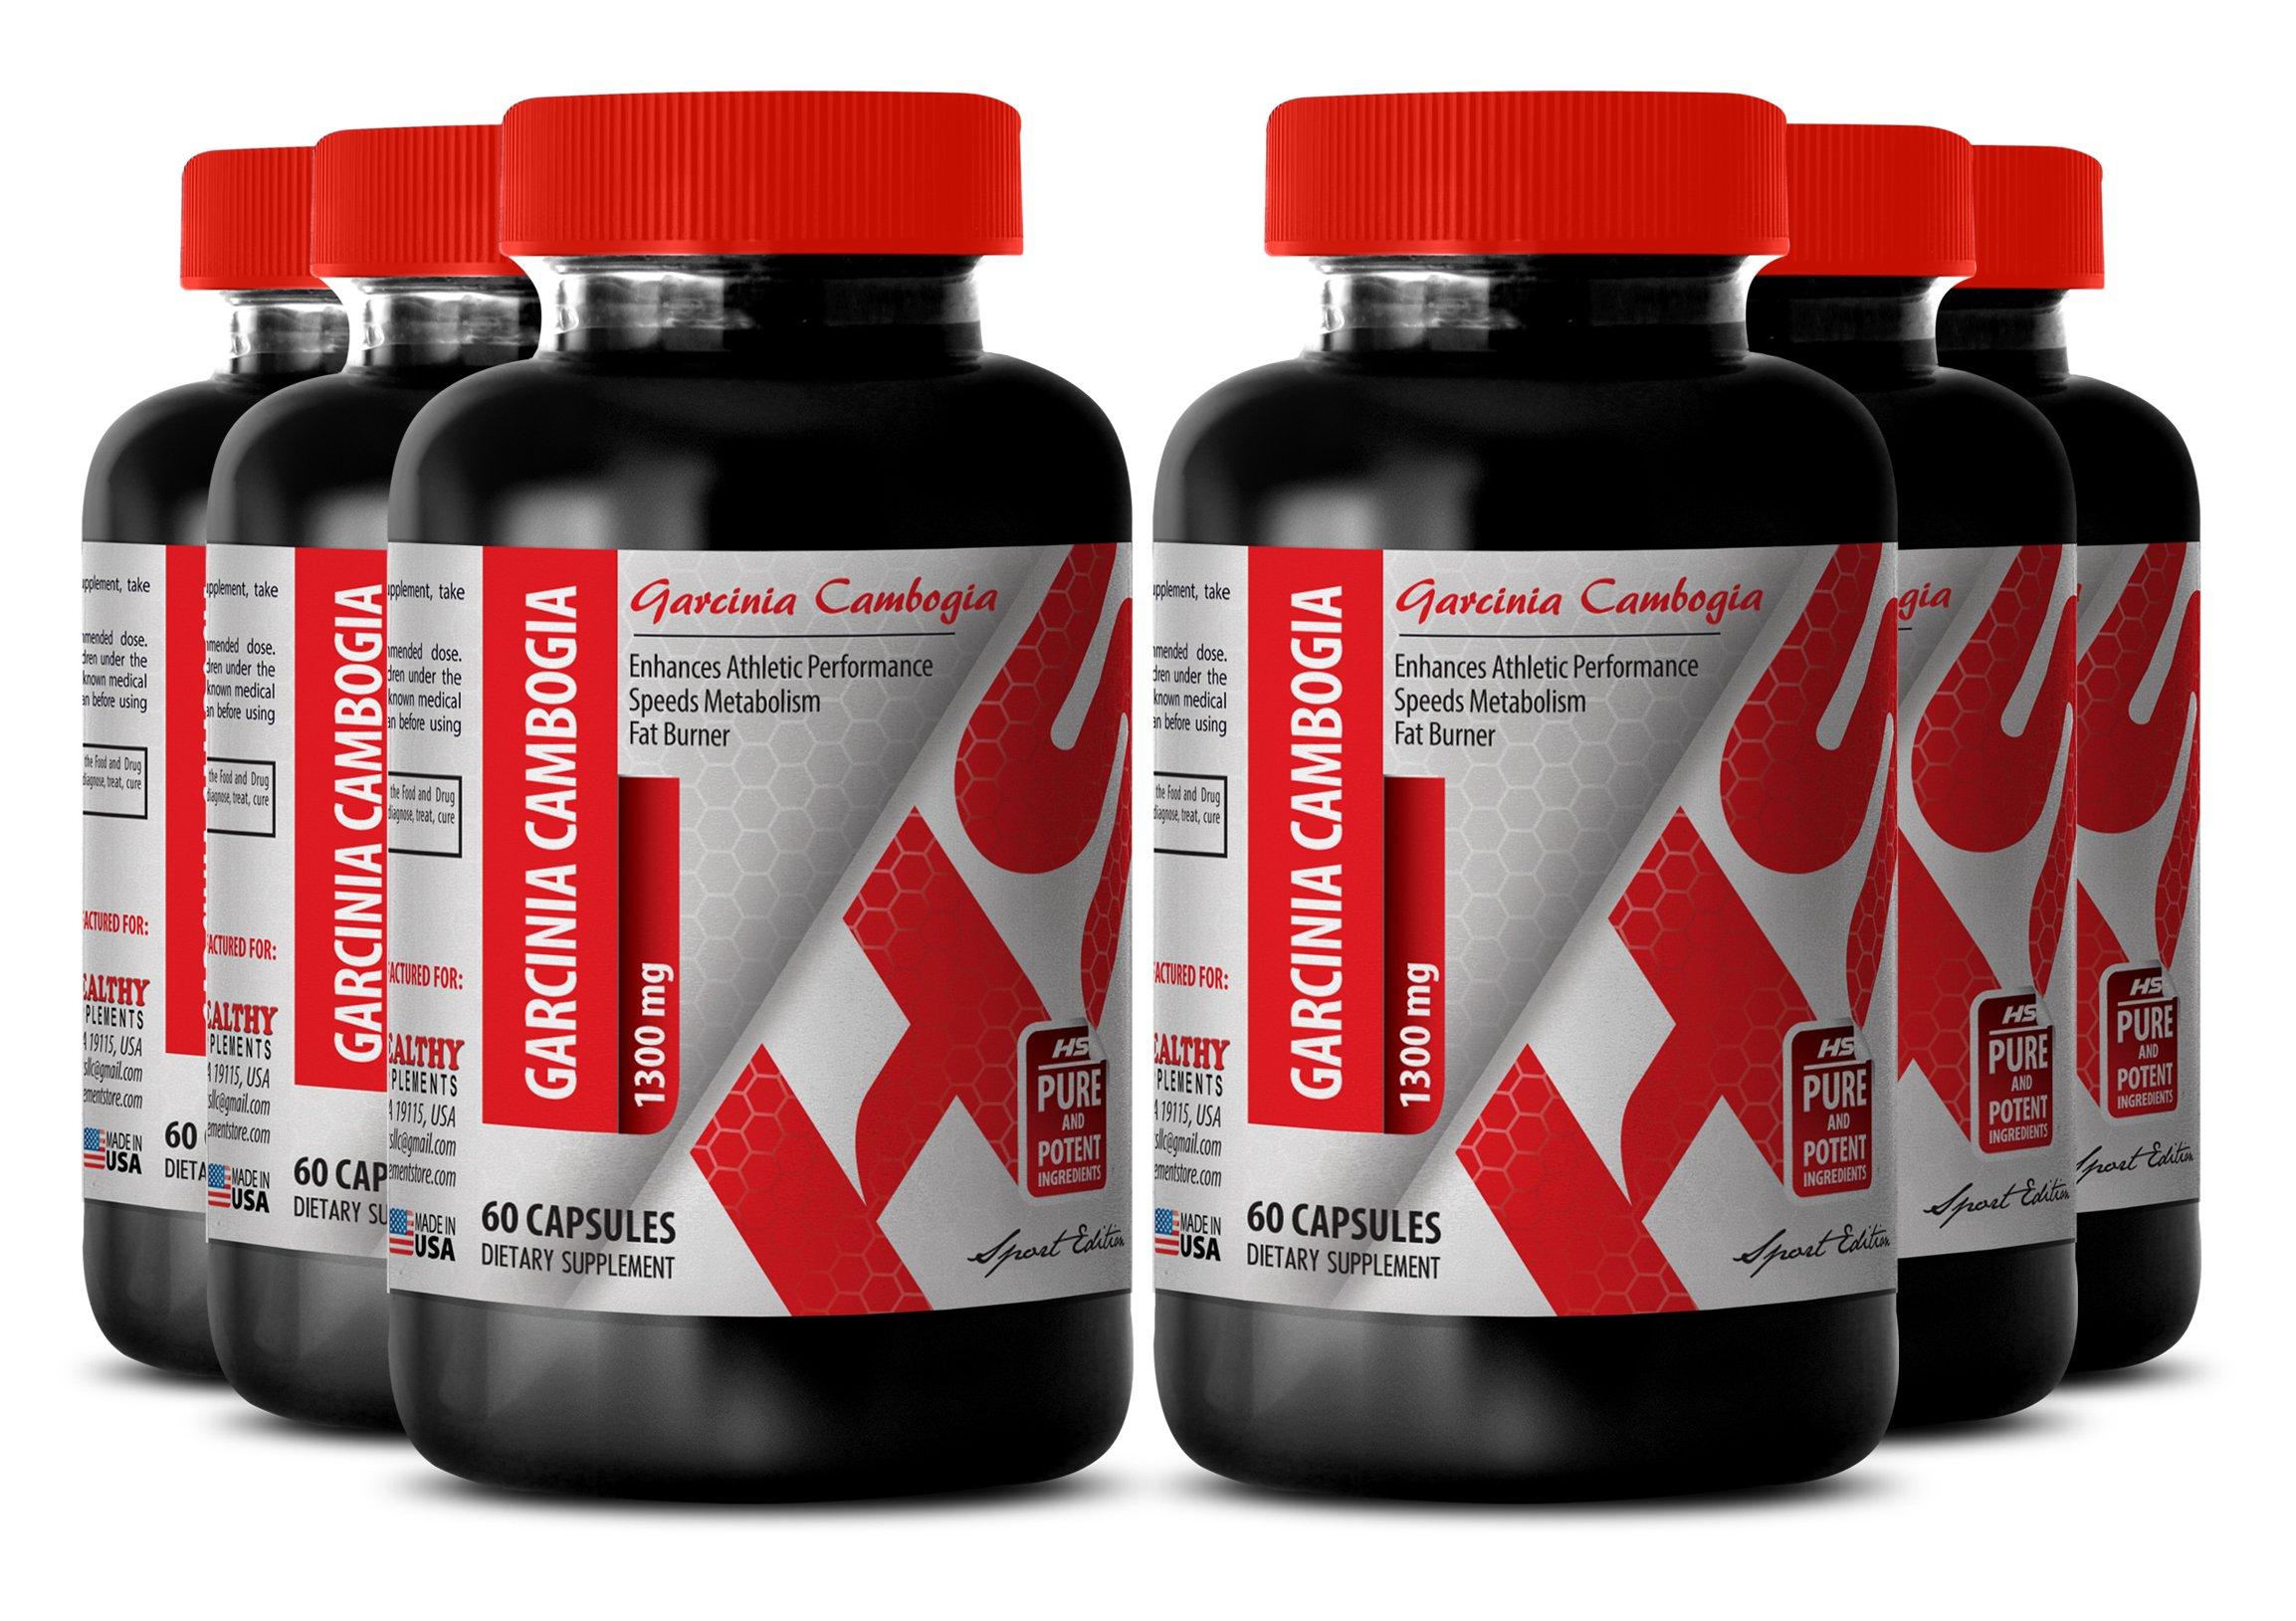 Garcinia cambogia green coffee bean - GARCINIA CAMBOGIA 1300MG - for weight loss results (6 Bottles)